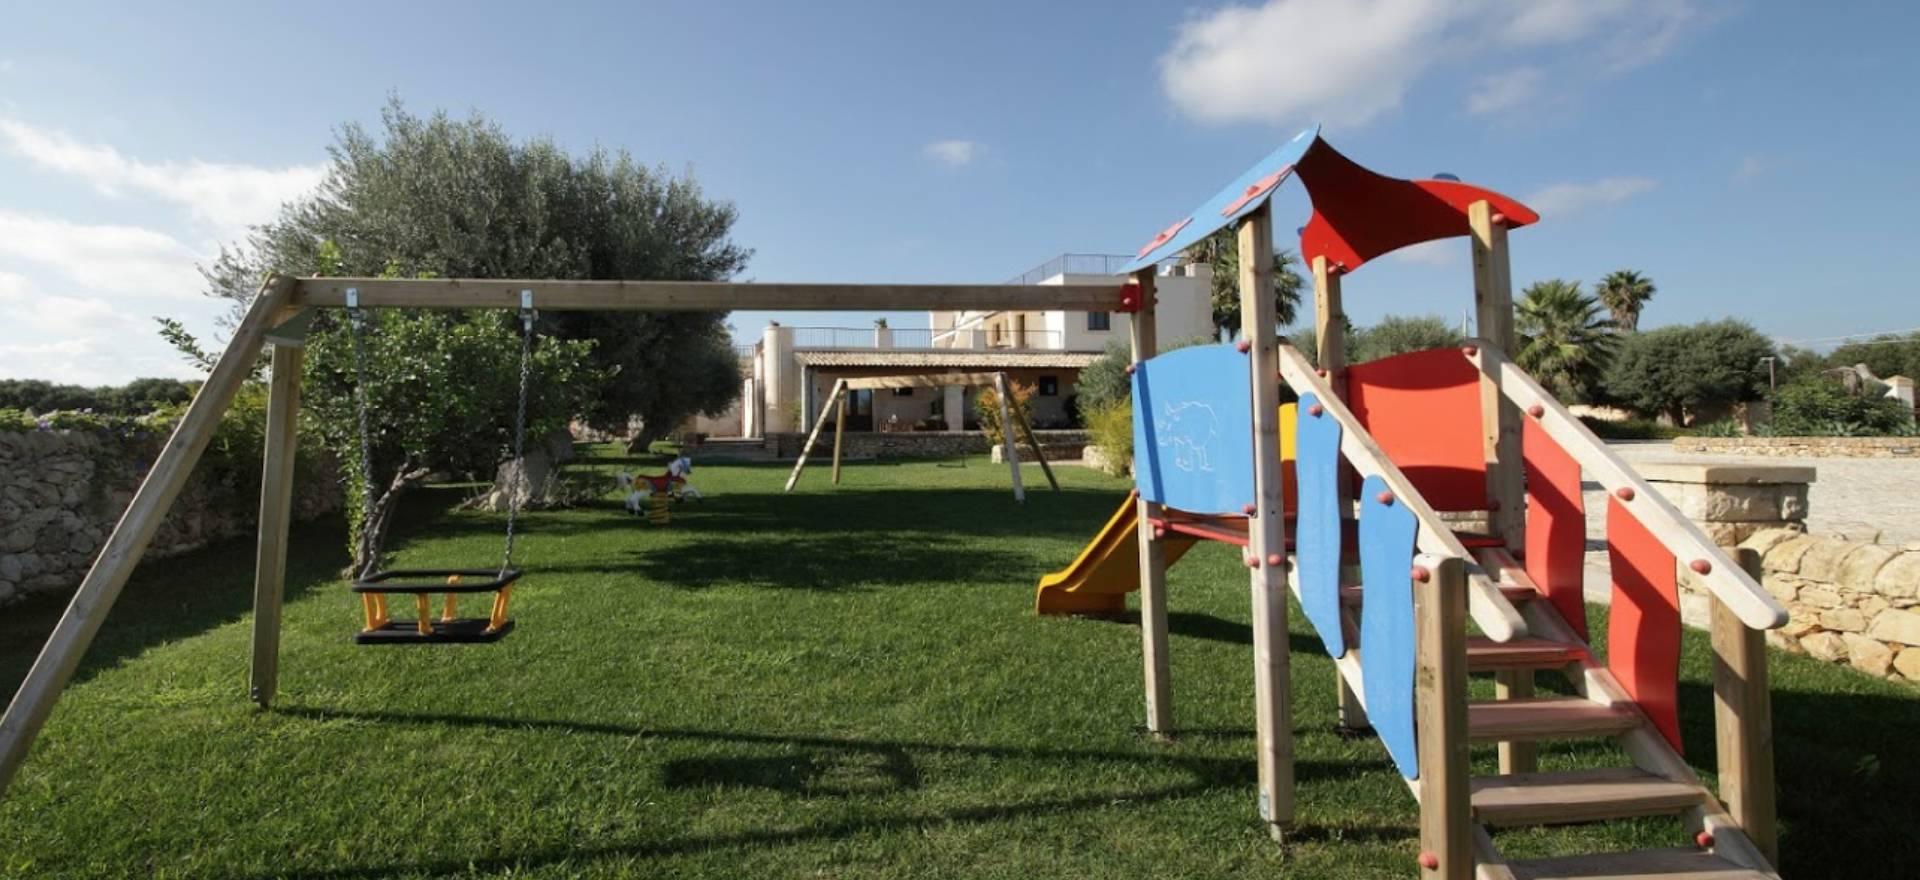 Agriturismo Sicilie Agriturismo vlakbij strand en met groot zwembad